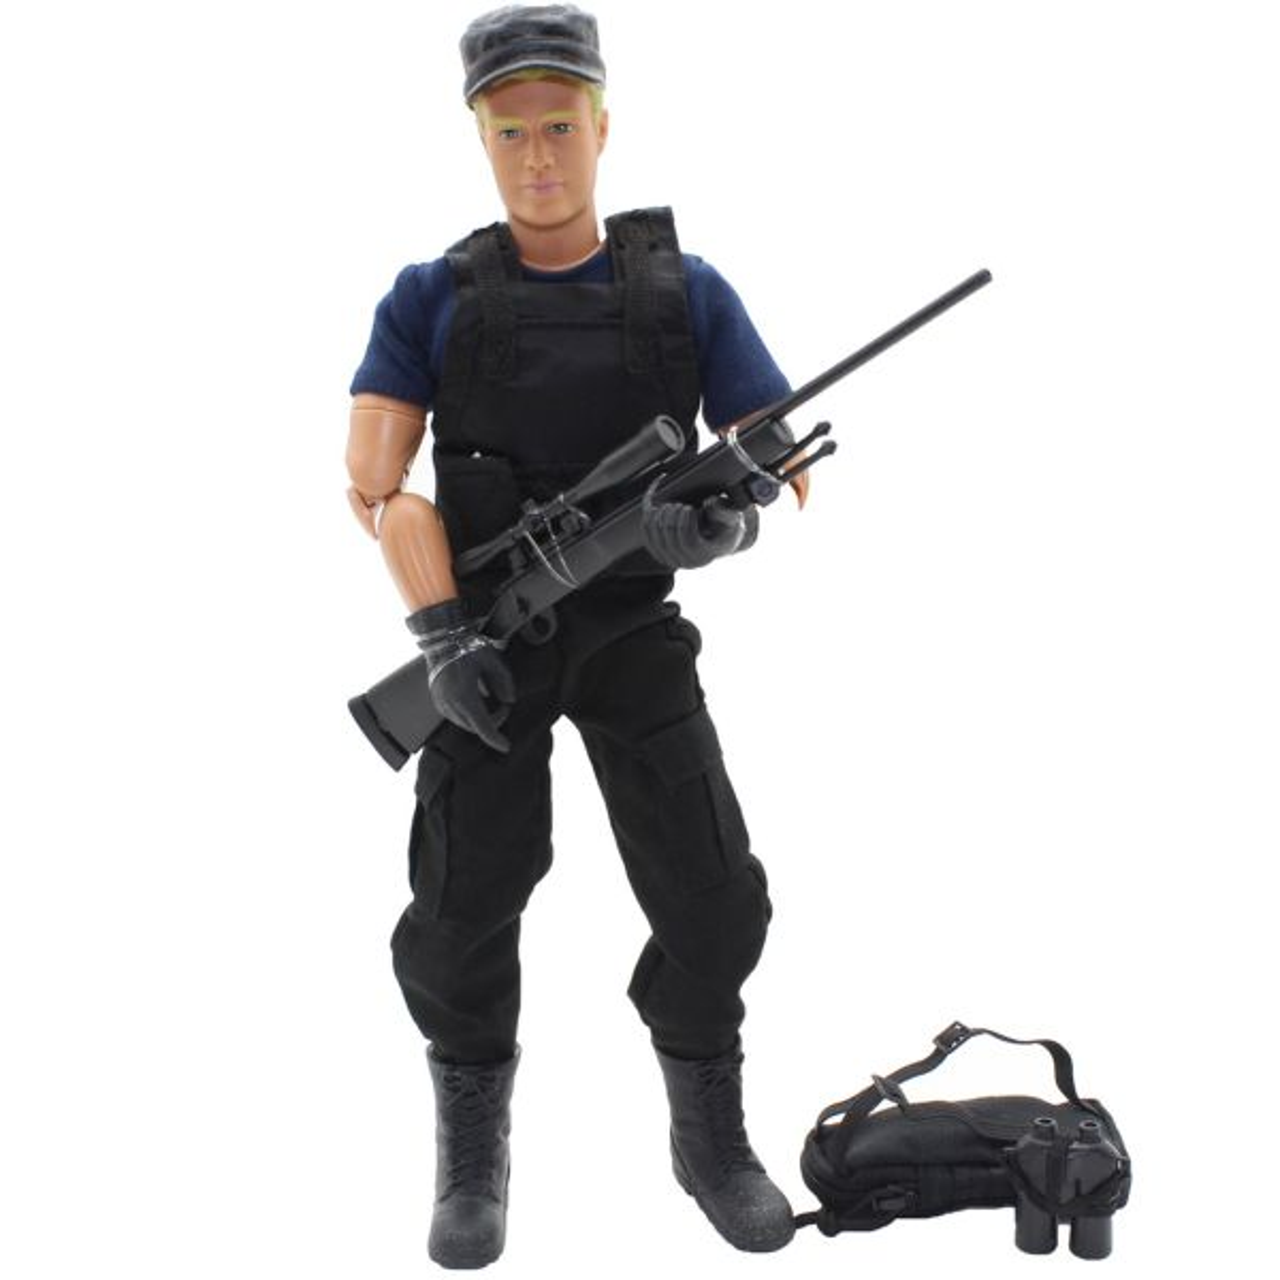 اکشن فیگور ام اند سی مدل Sniper Police 90360C